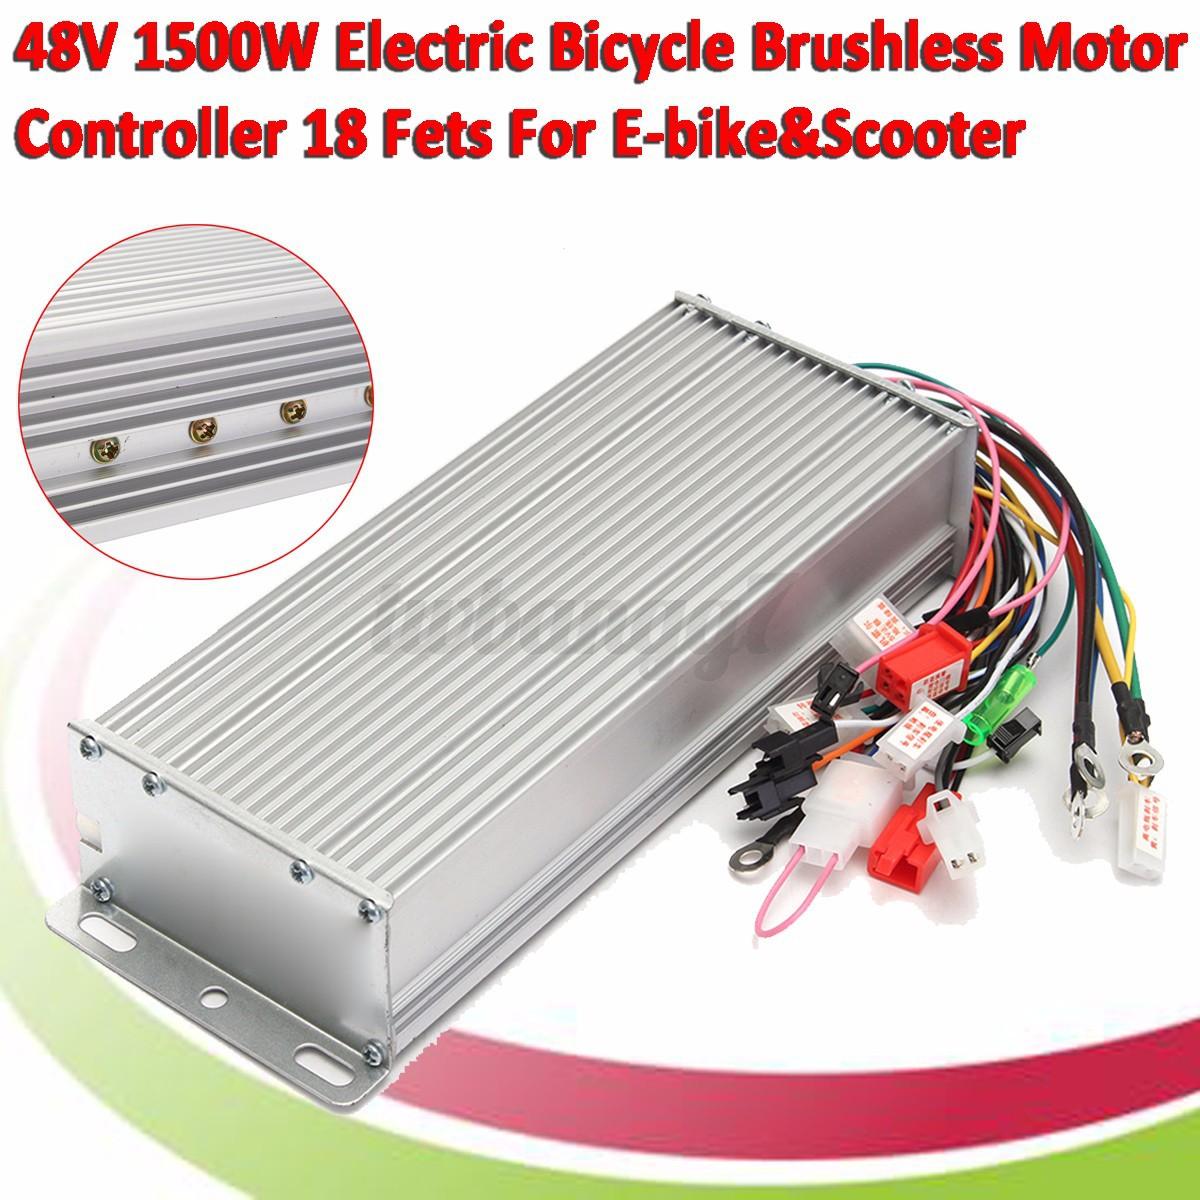 48v dc 1500w brushless motor controller for e bike scooter for Brushless dc electric motor